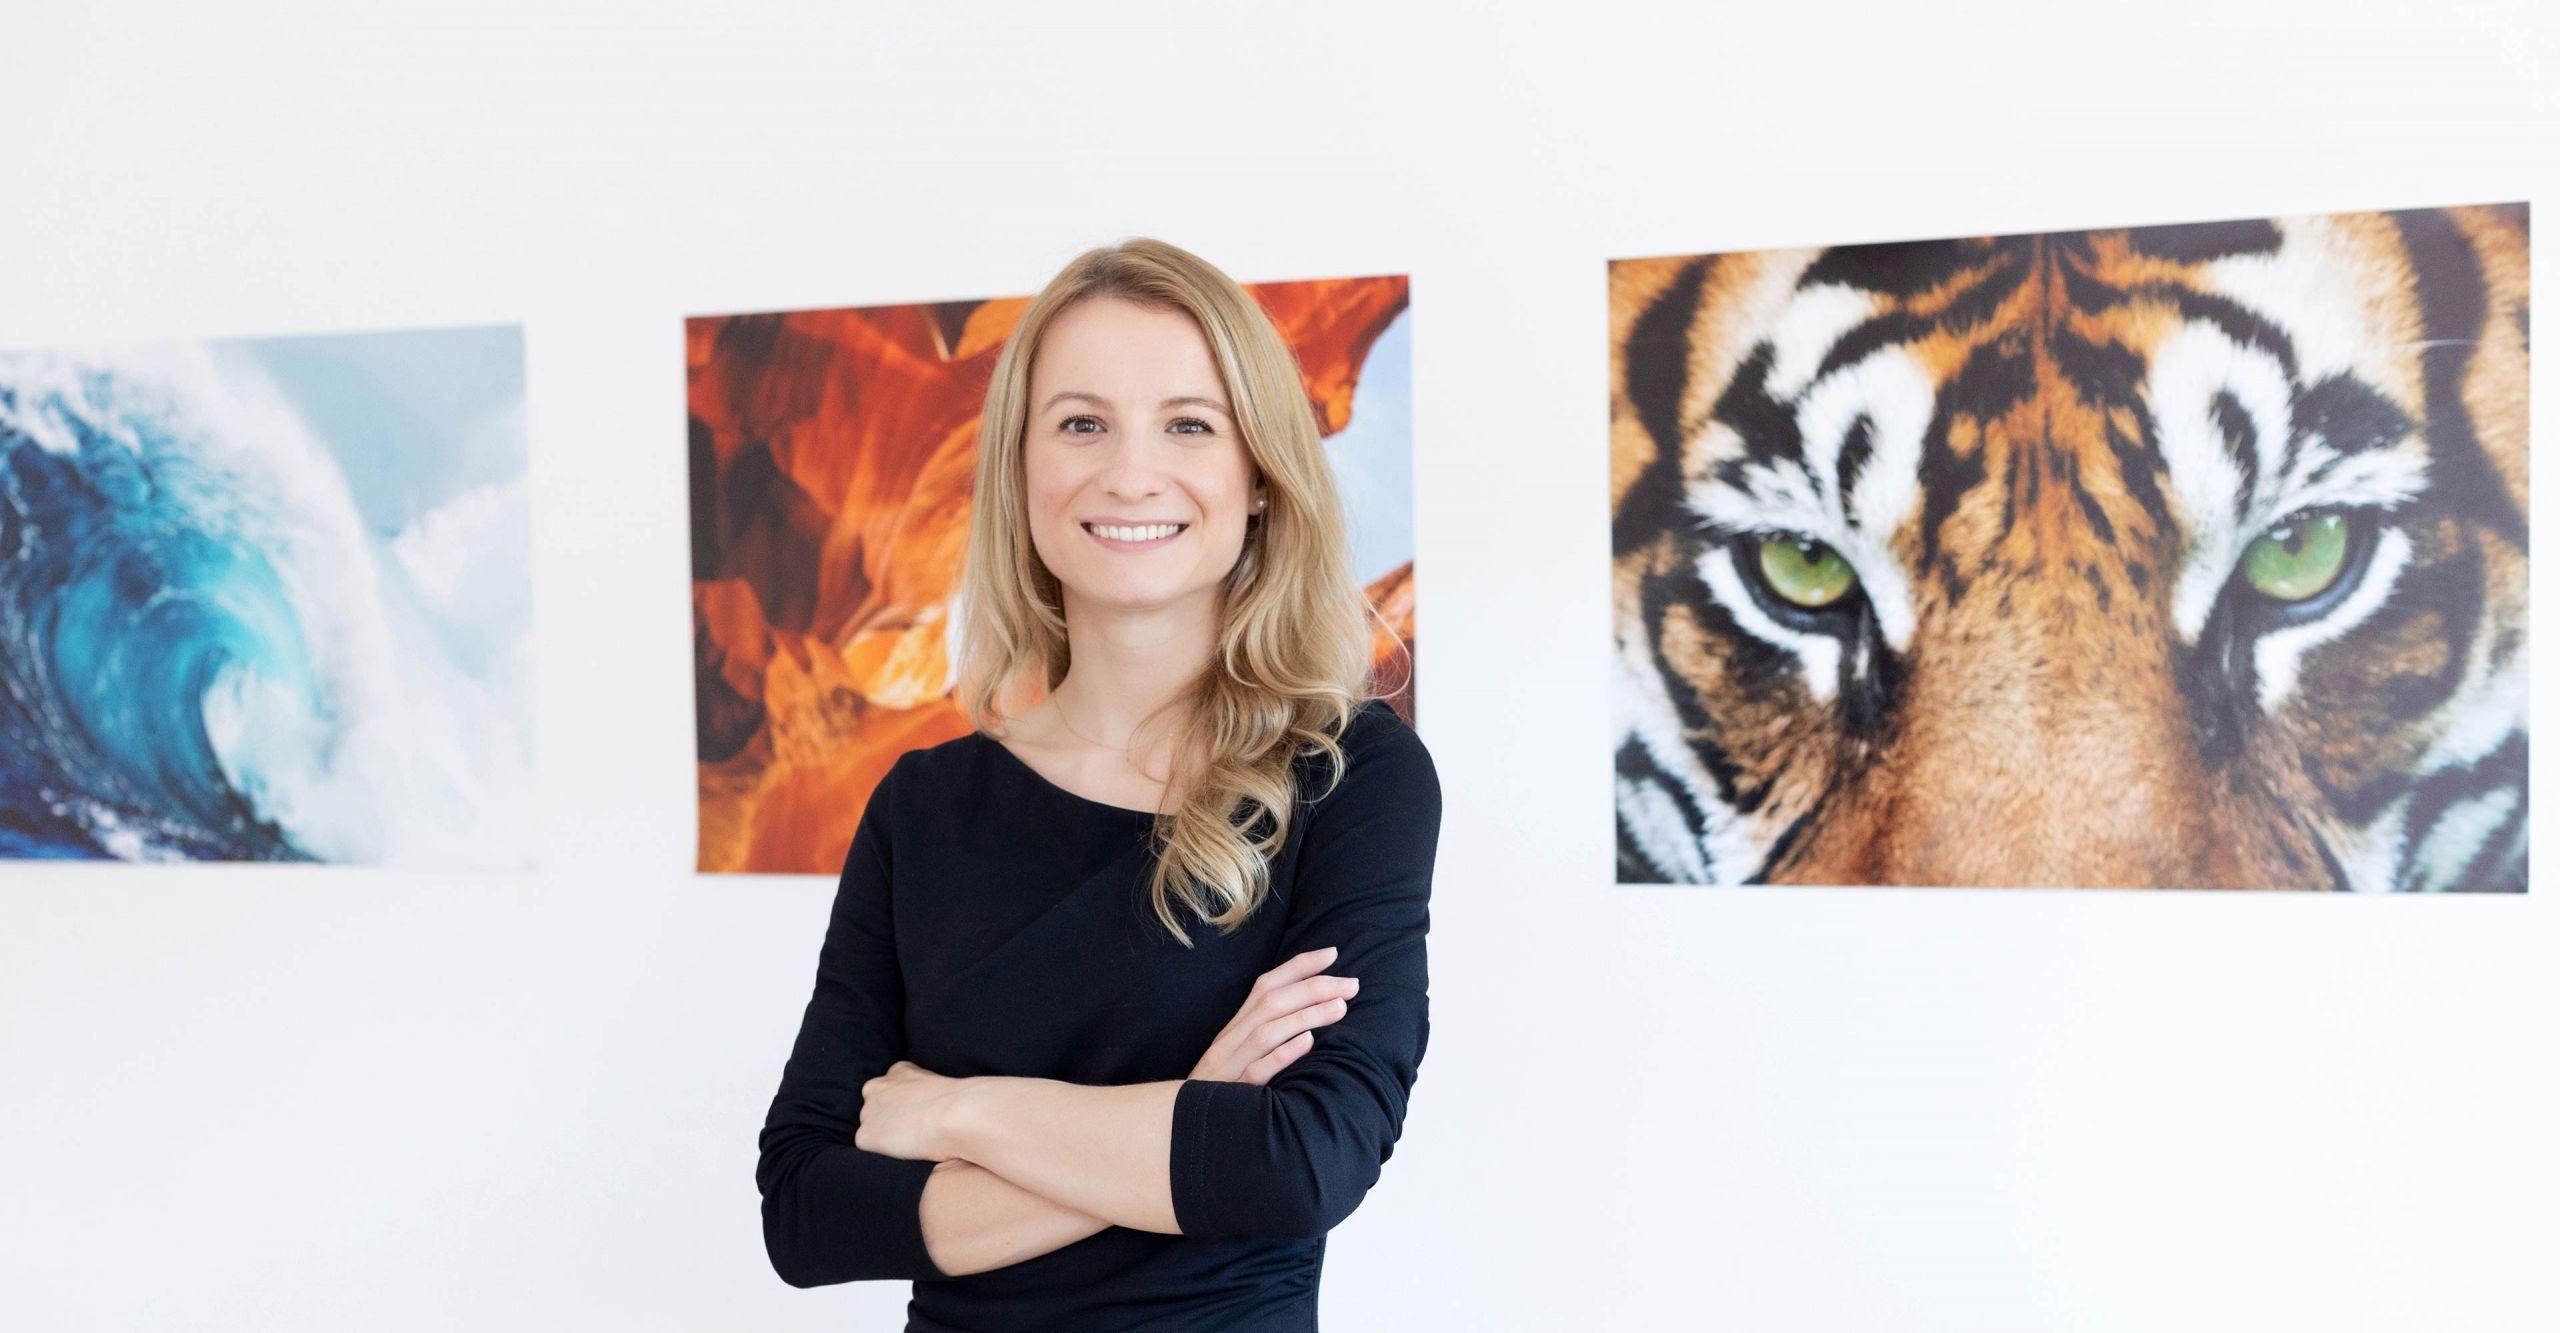 Rechtsanwältin Ramona Frenzel